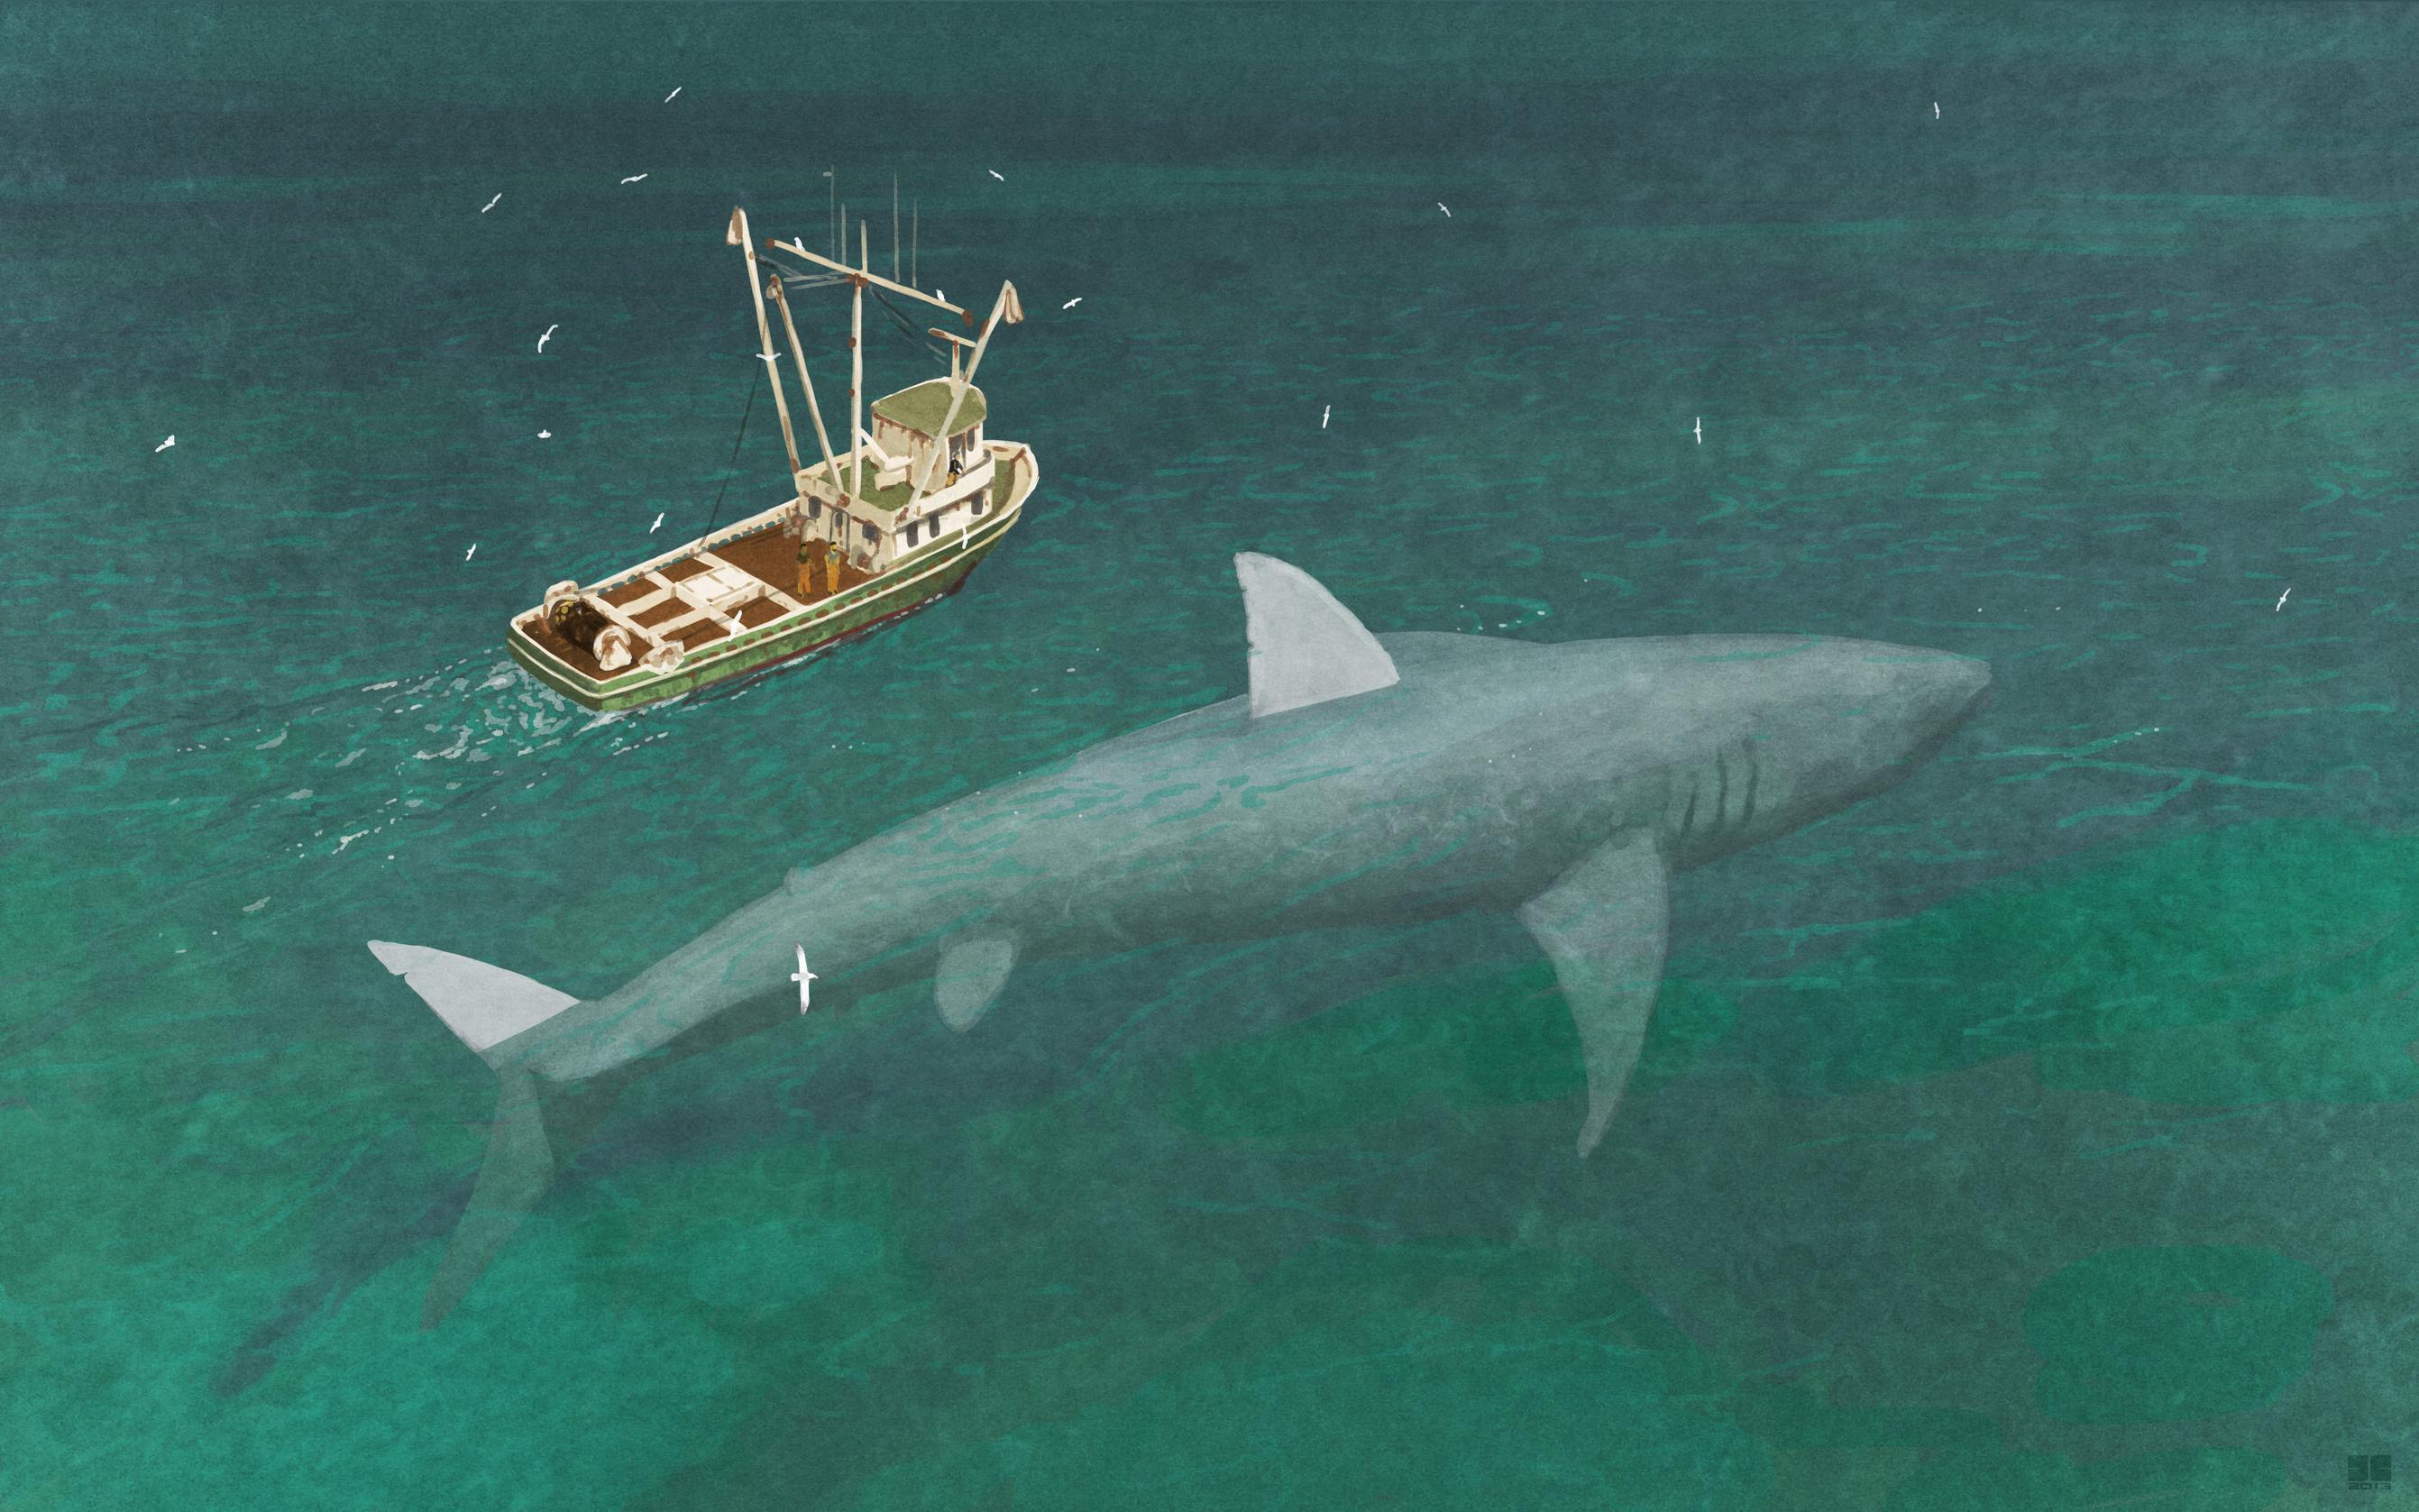 Megalodon next to Ship Wallpaper HD Sharks Ship Hd To 2683x1677